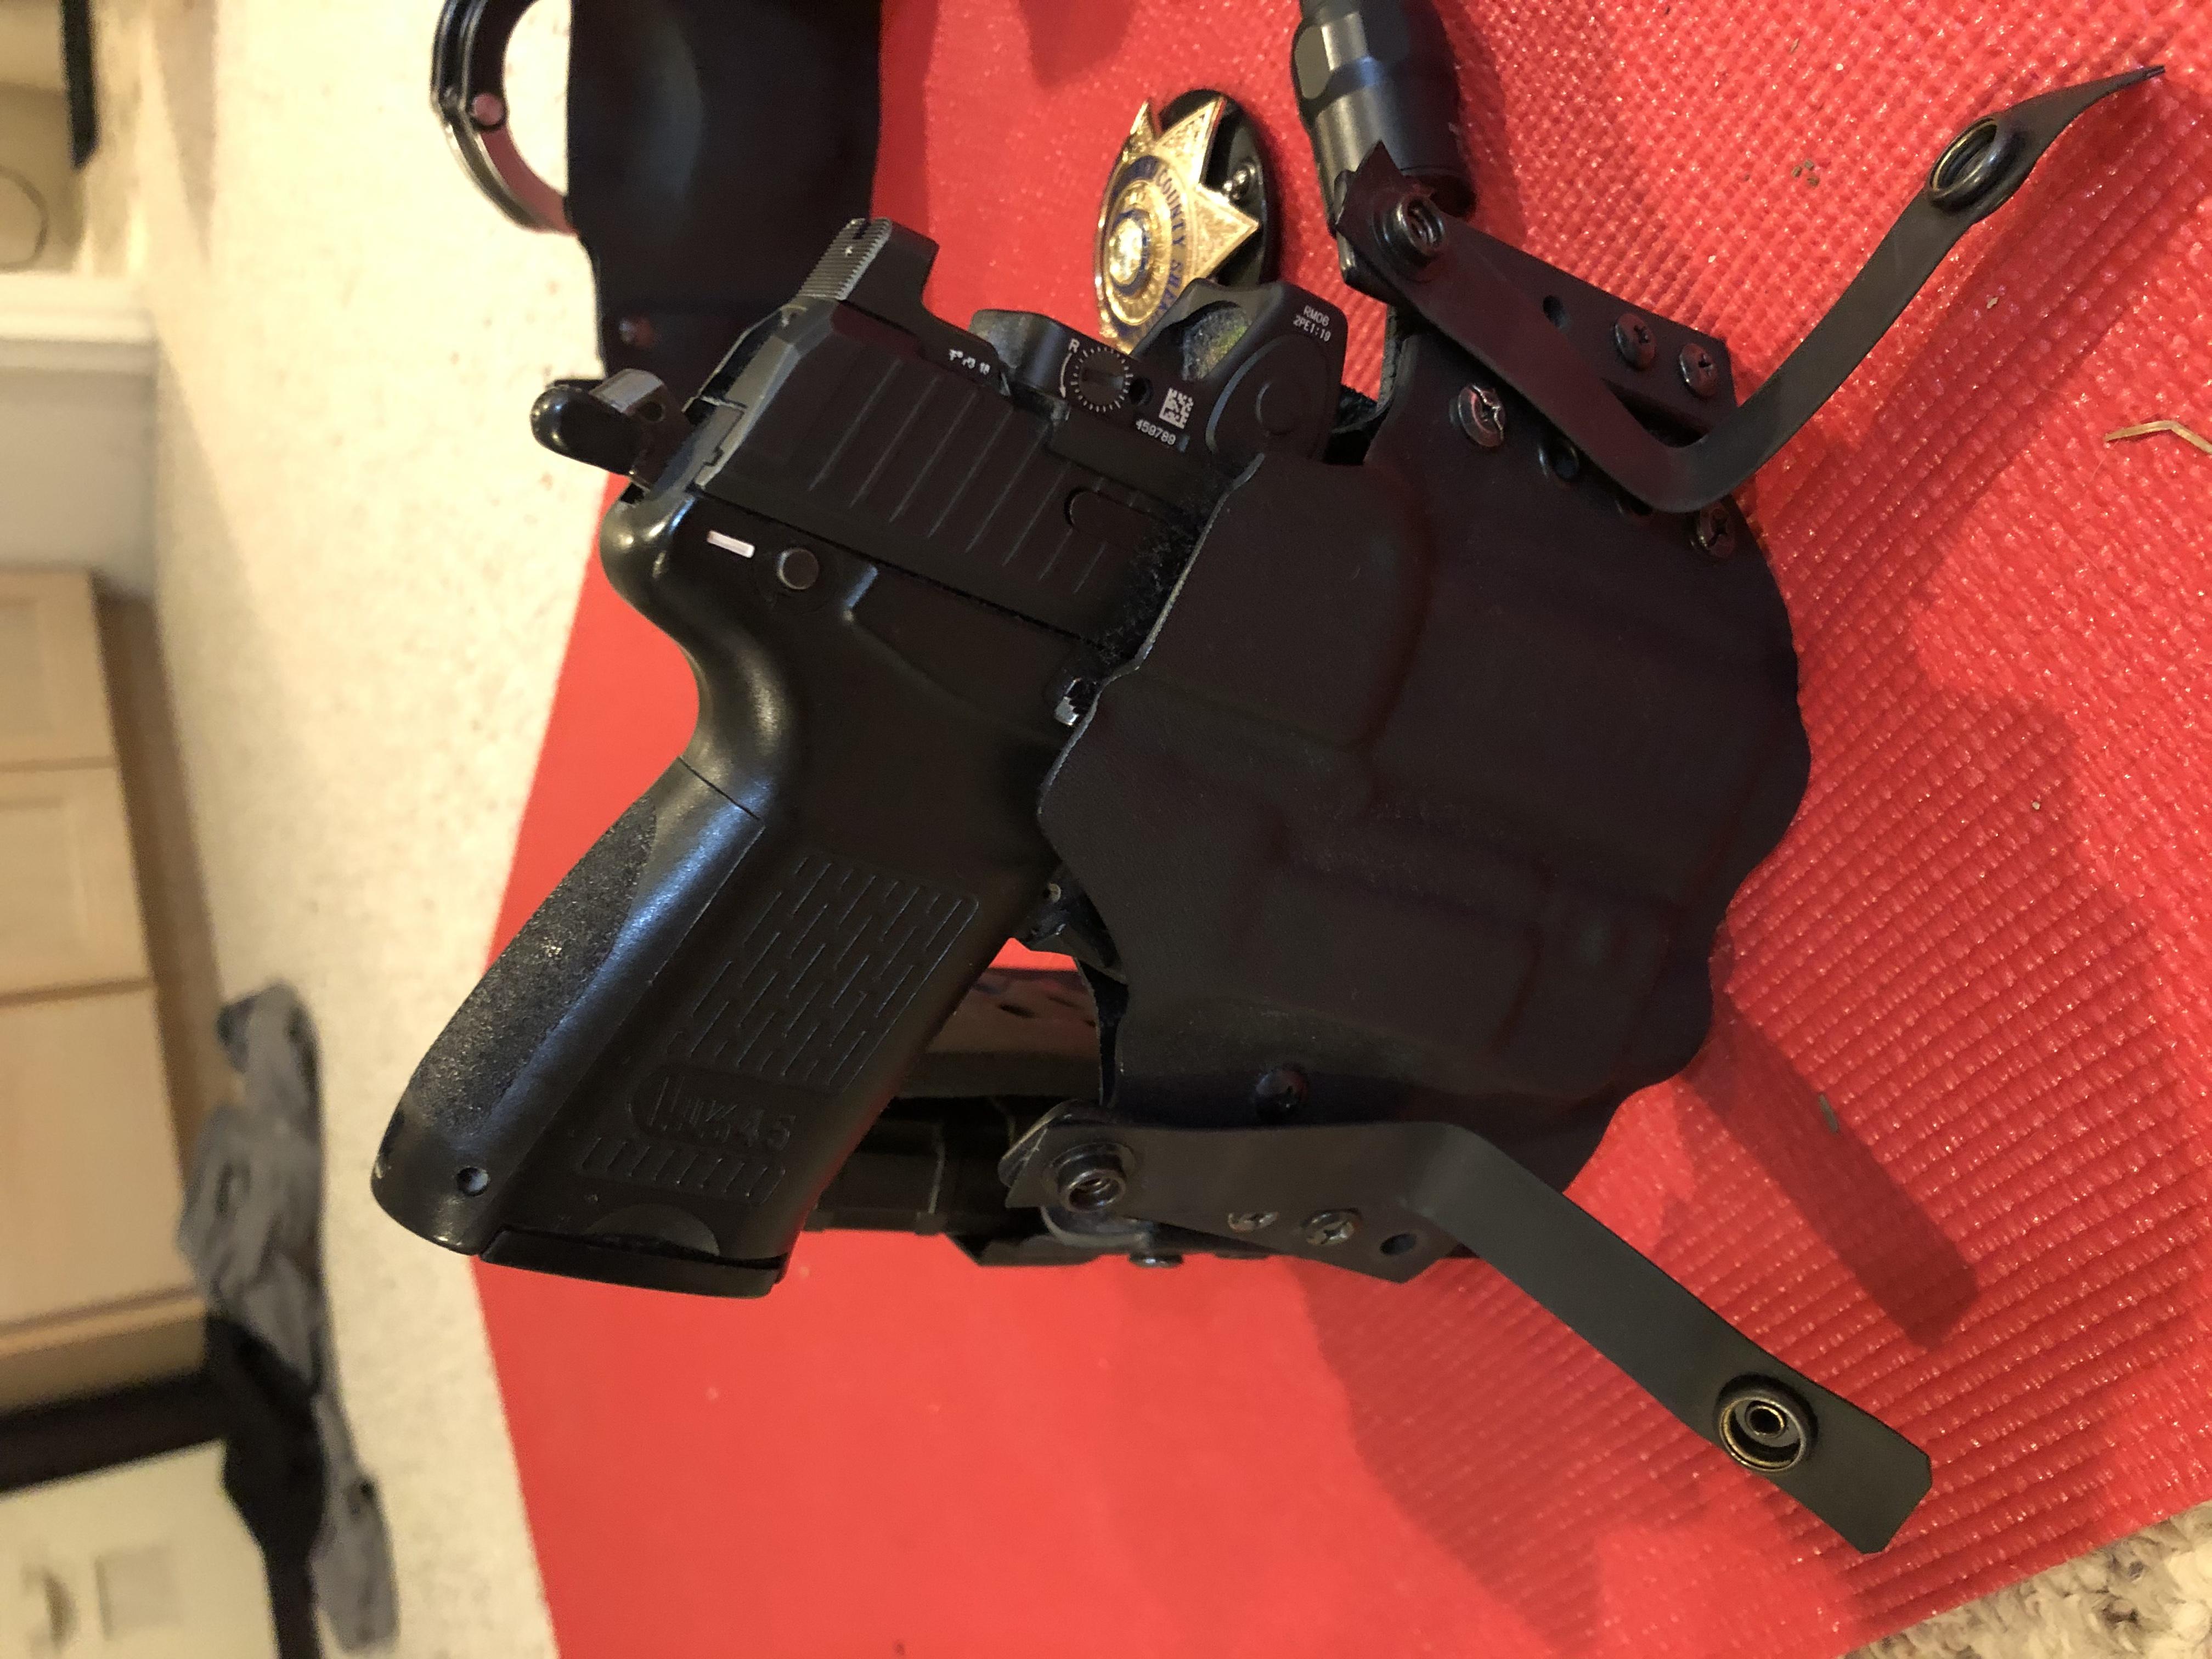 HK45C, APO/Red Dot (RMR20), TLR7, and Kaluban Cloak holster. UPDATE-9637579a-f9b6-4f65-a56b-f9883e672b38.jpeg